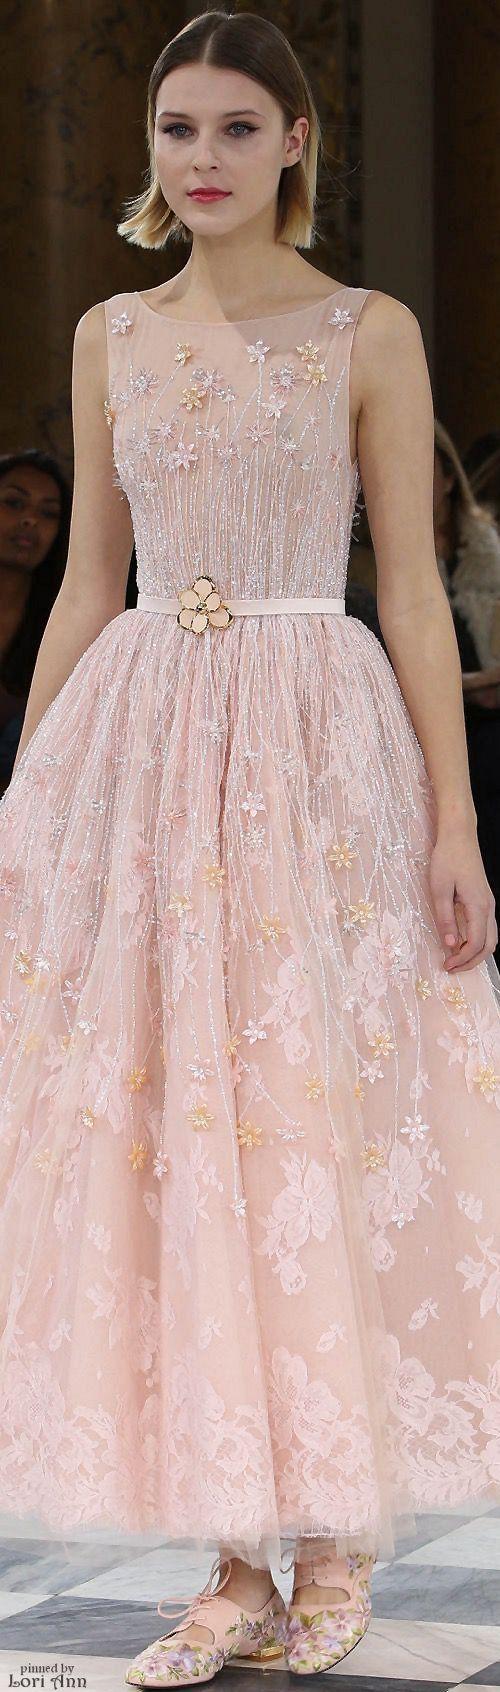 165 best Fashion images on Pinterest | Chic clothing, Clothing ...